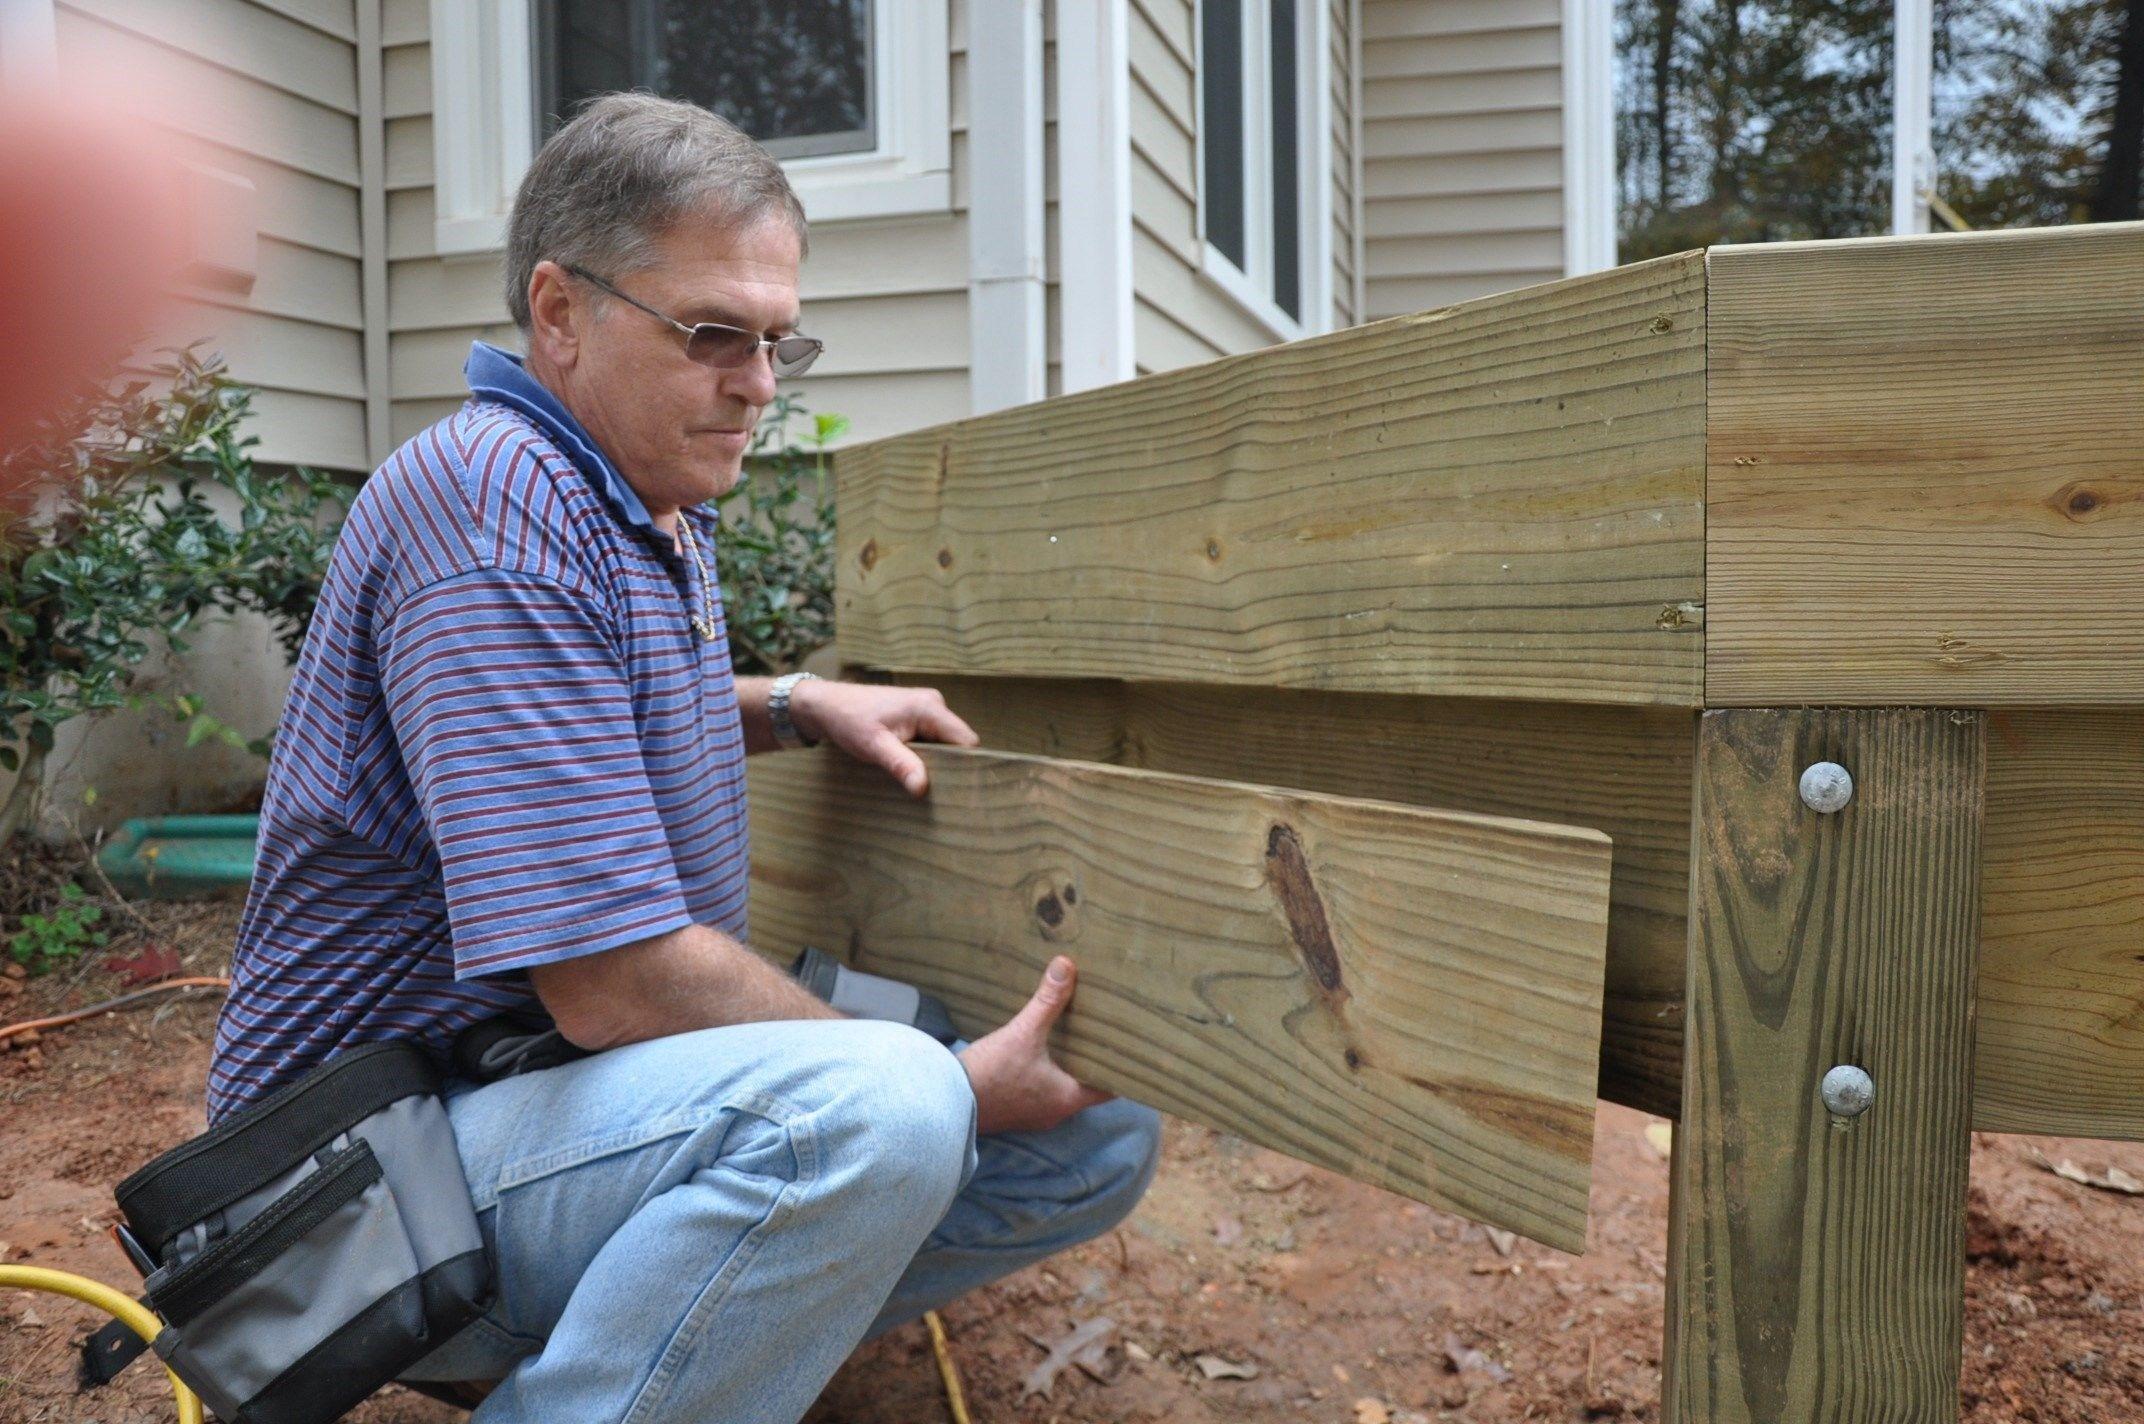 Stair Stringer Attachment Decks Com | 2 Step Outdoor Stairs | Landing | Exterior | Redwood Deck | Cantilever Deck | 8 Foot